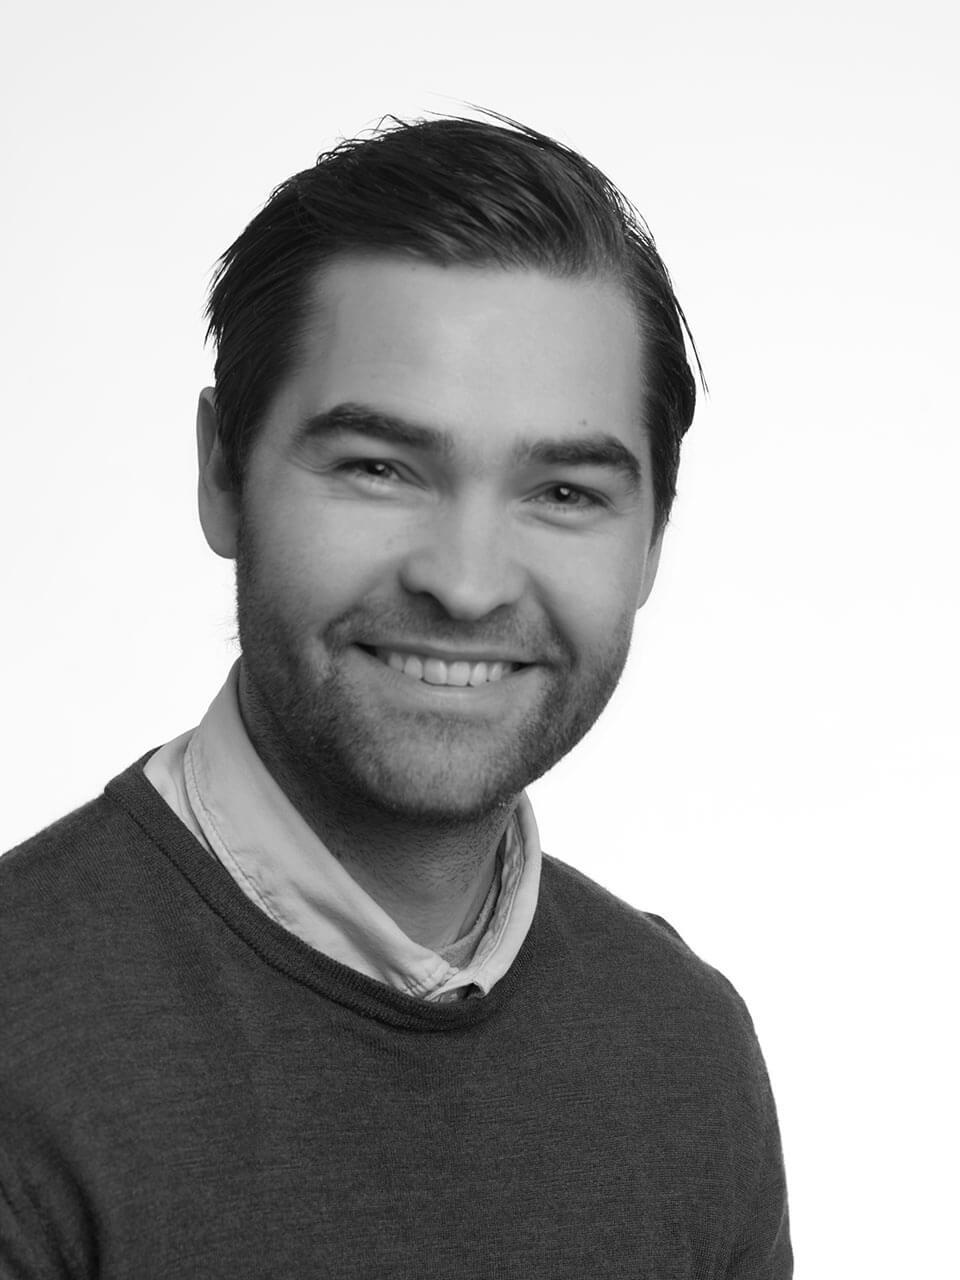 Arnar Jonsson Solustjori Smartmedia